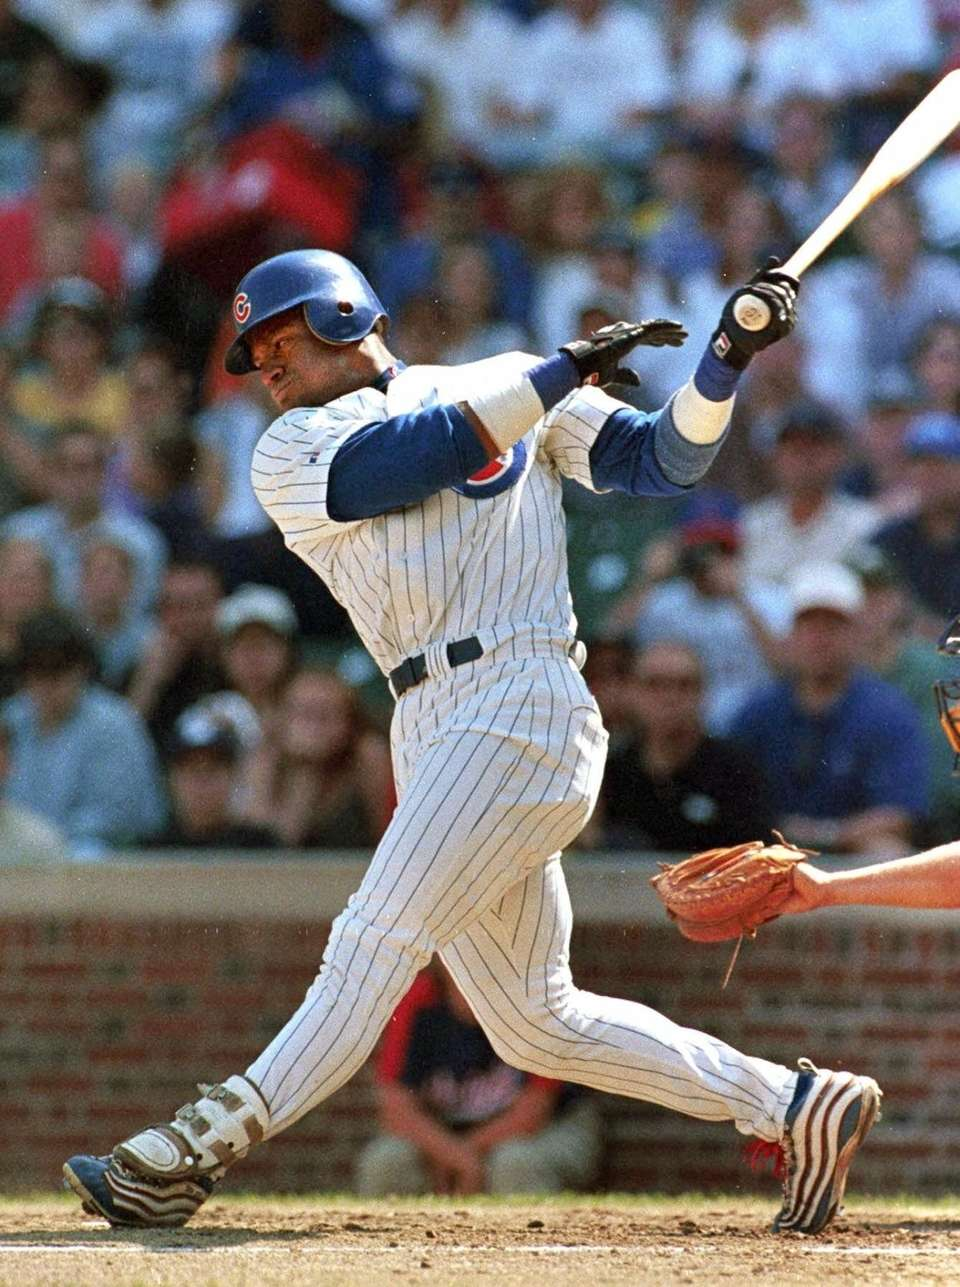 SAMMY SOSA 1999, Chicago Cubs 63 home runs